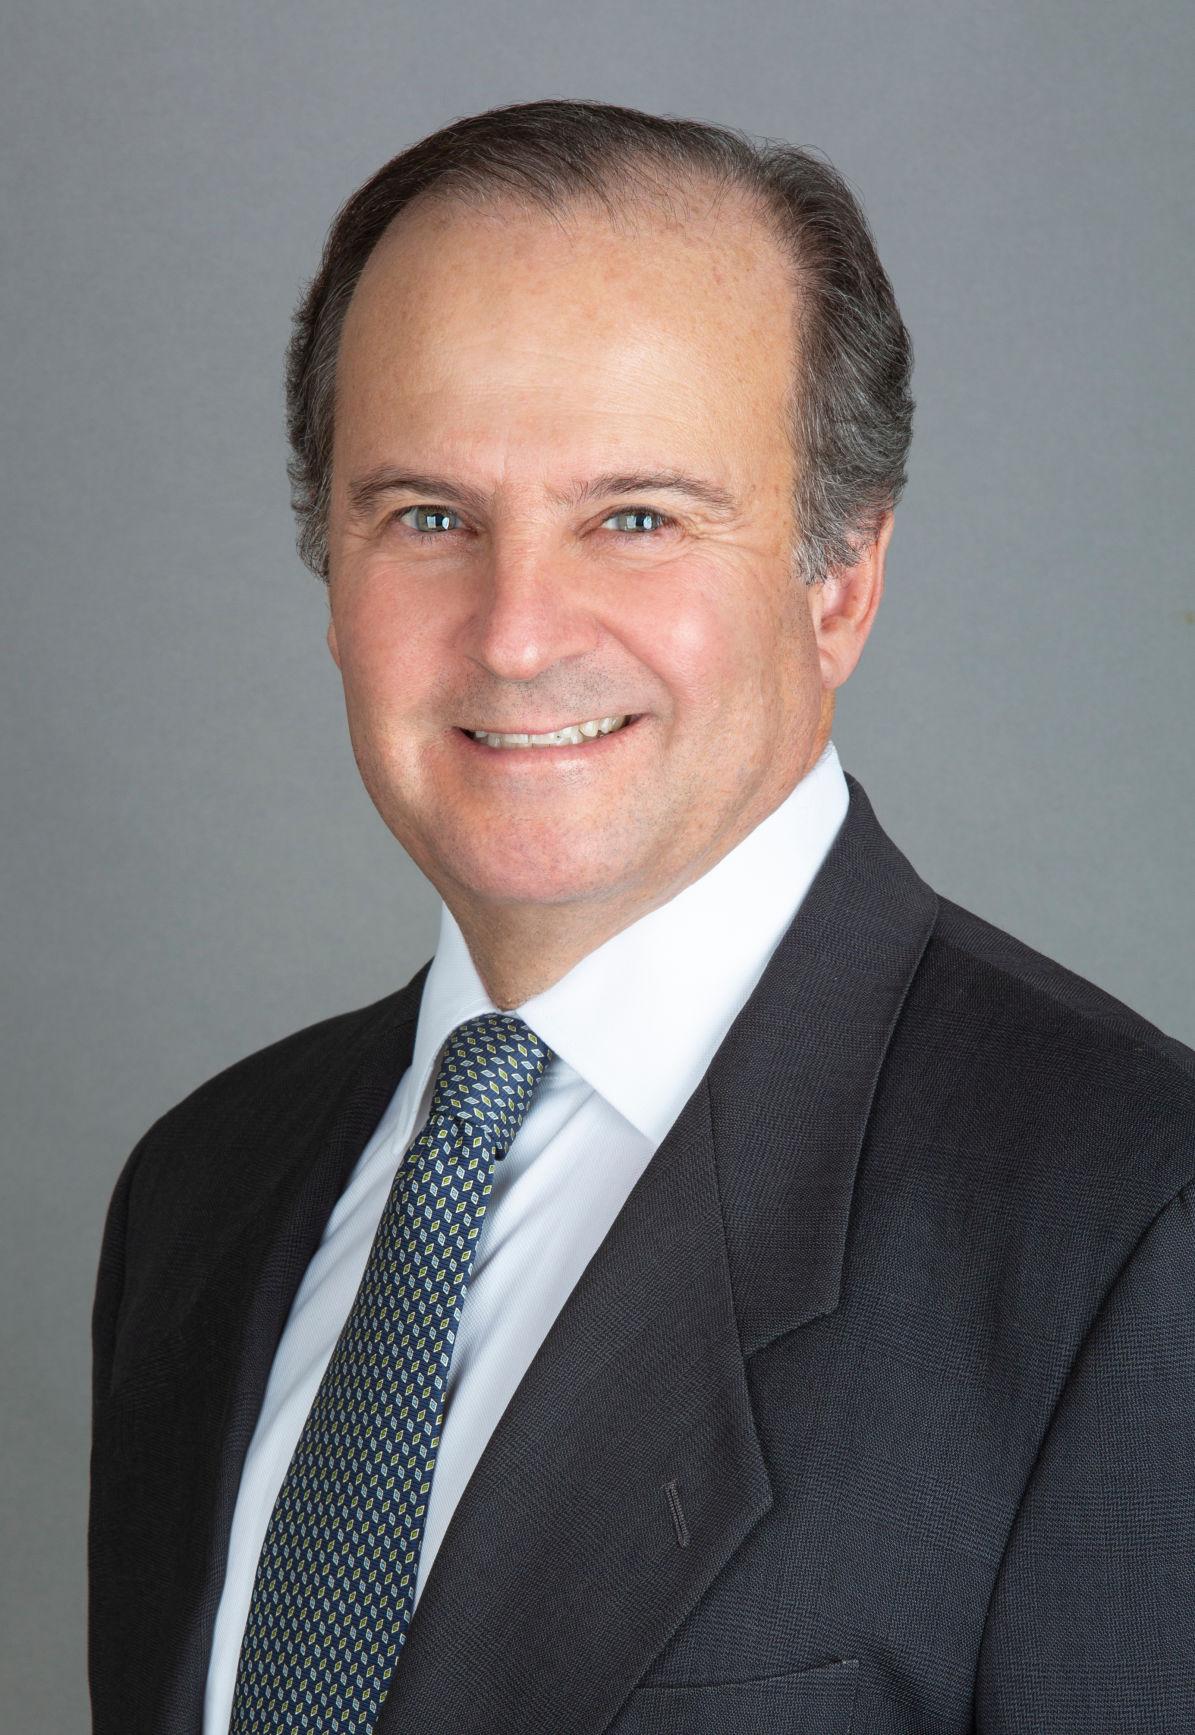 David Marguleas